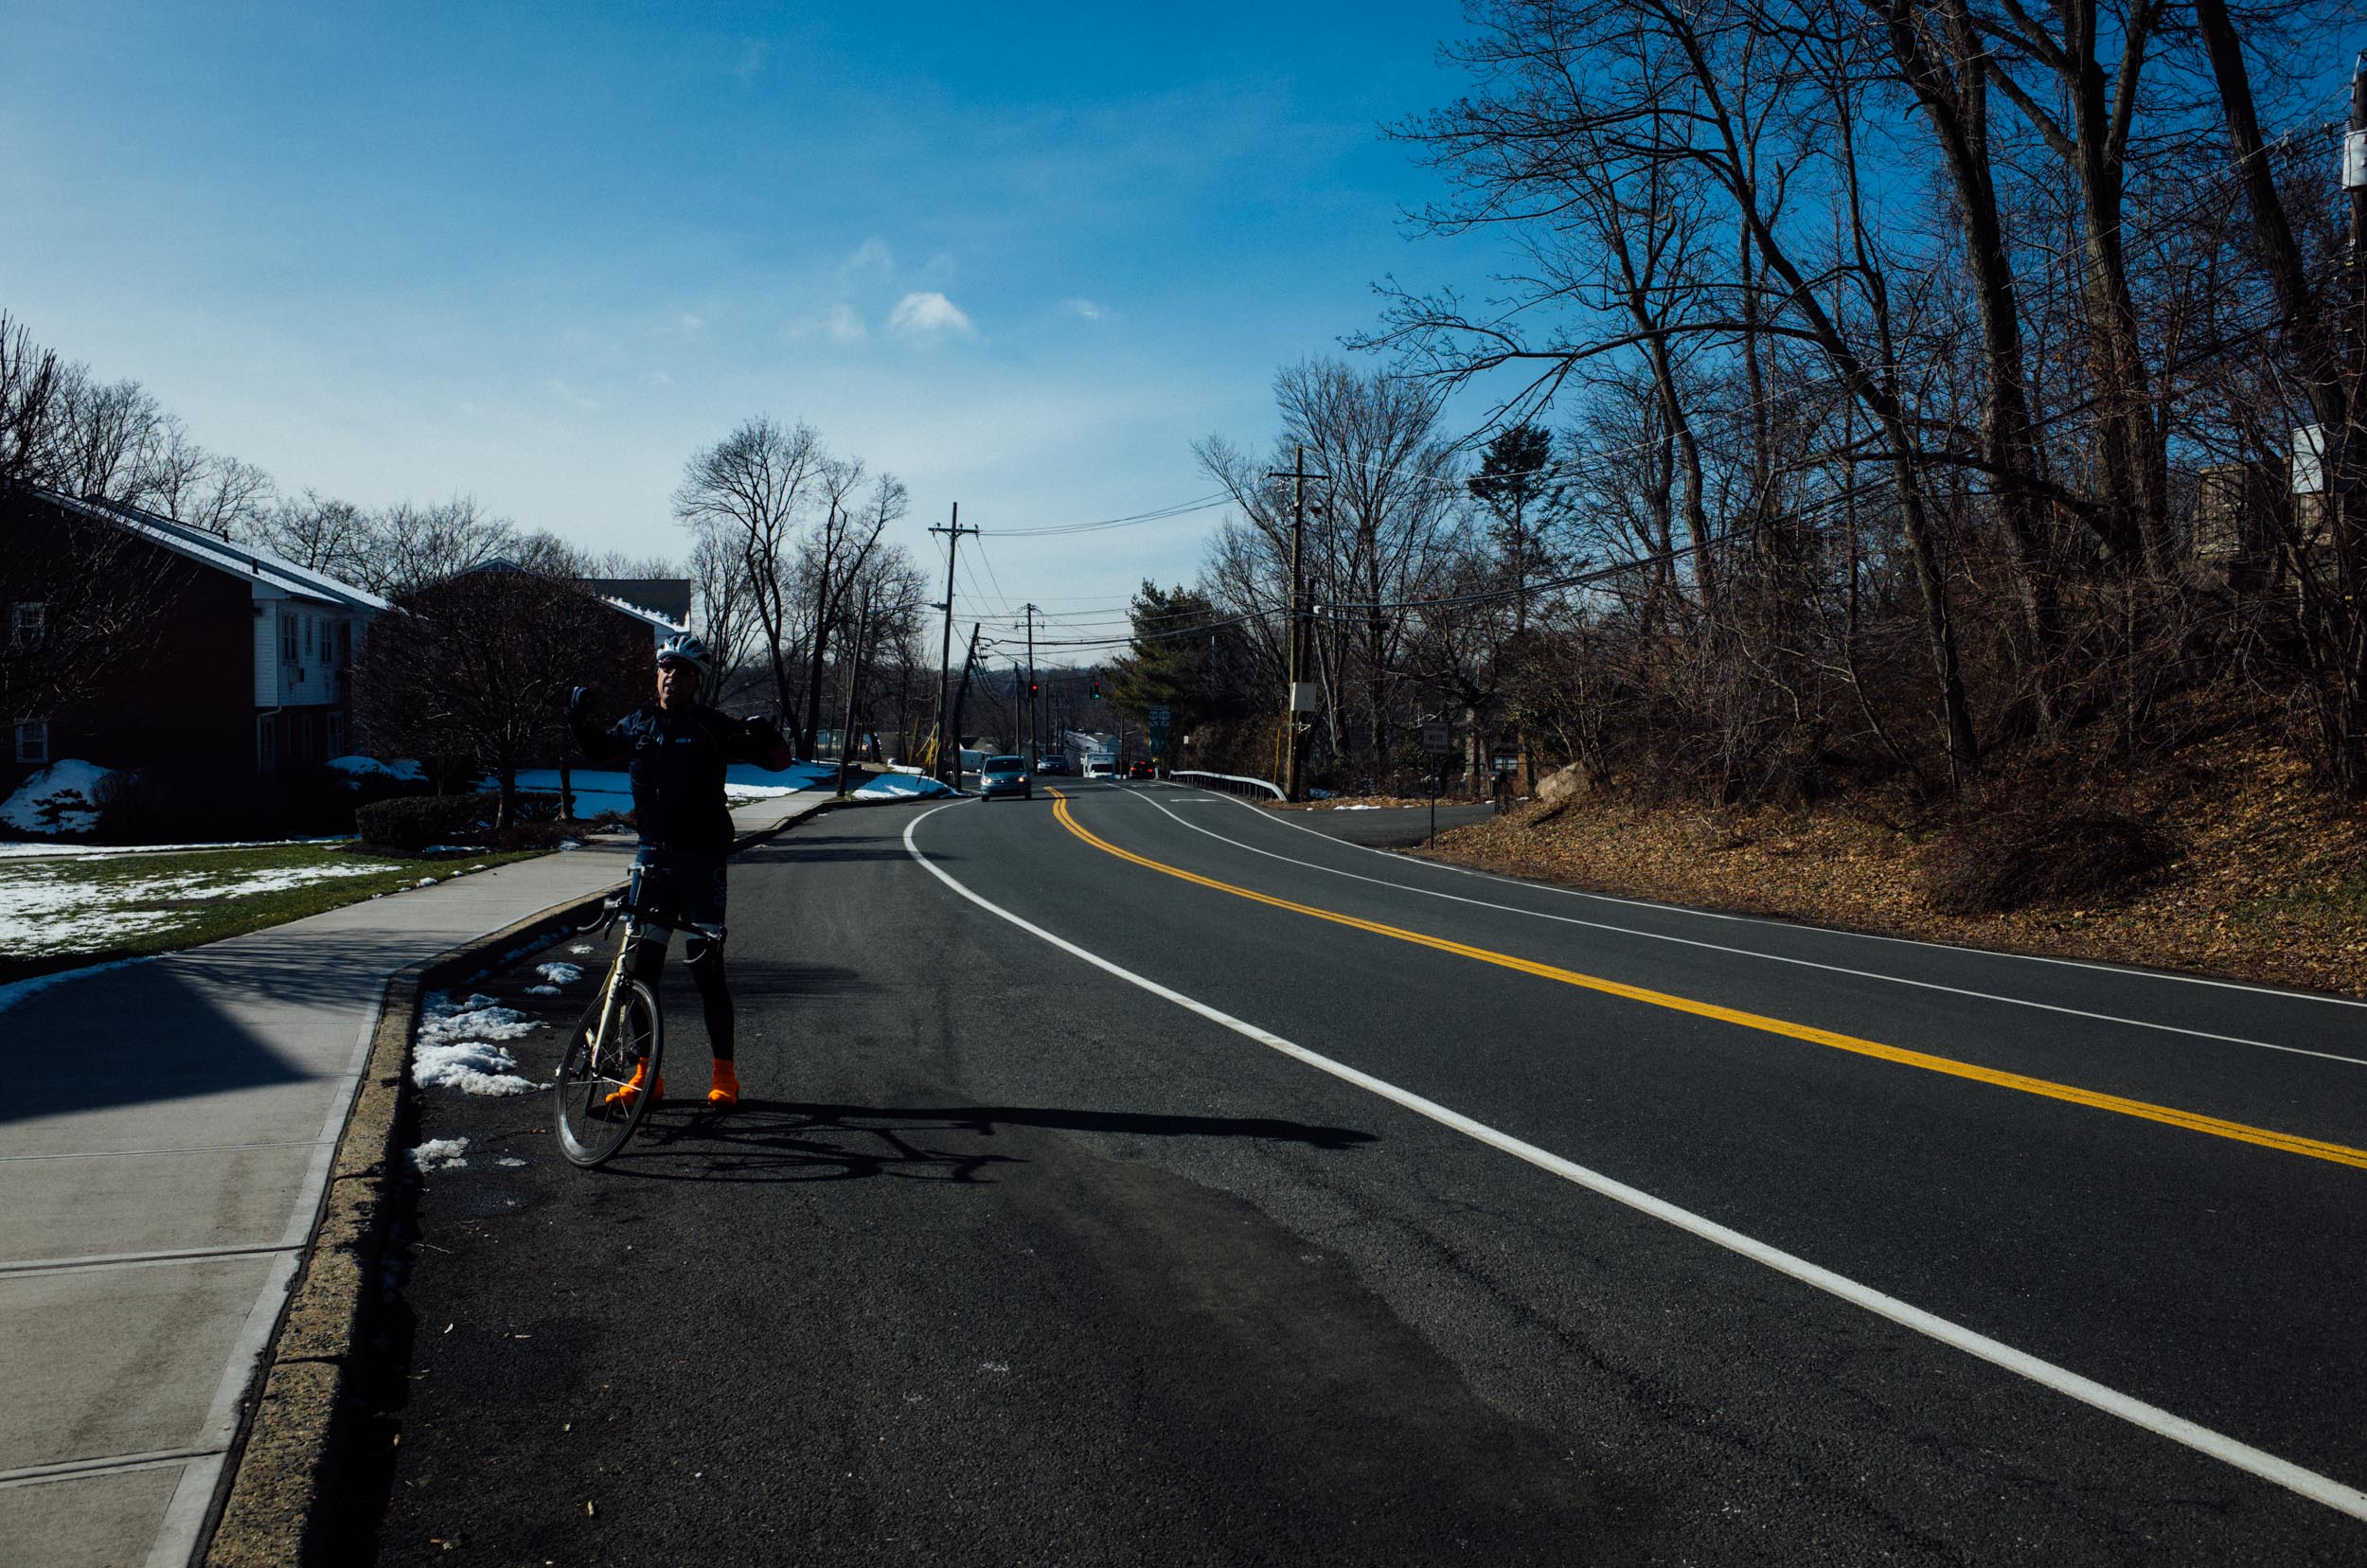 Photo Rhetoric - 2016-02-06 Team Ride-1000.jpg